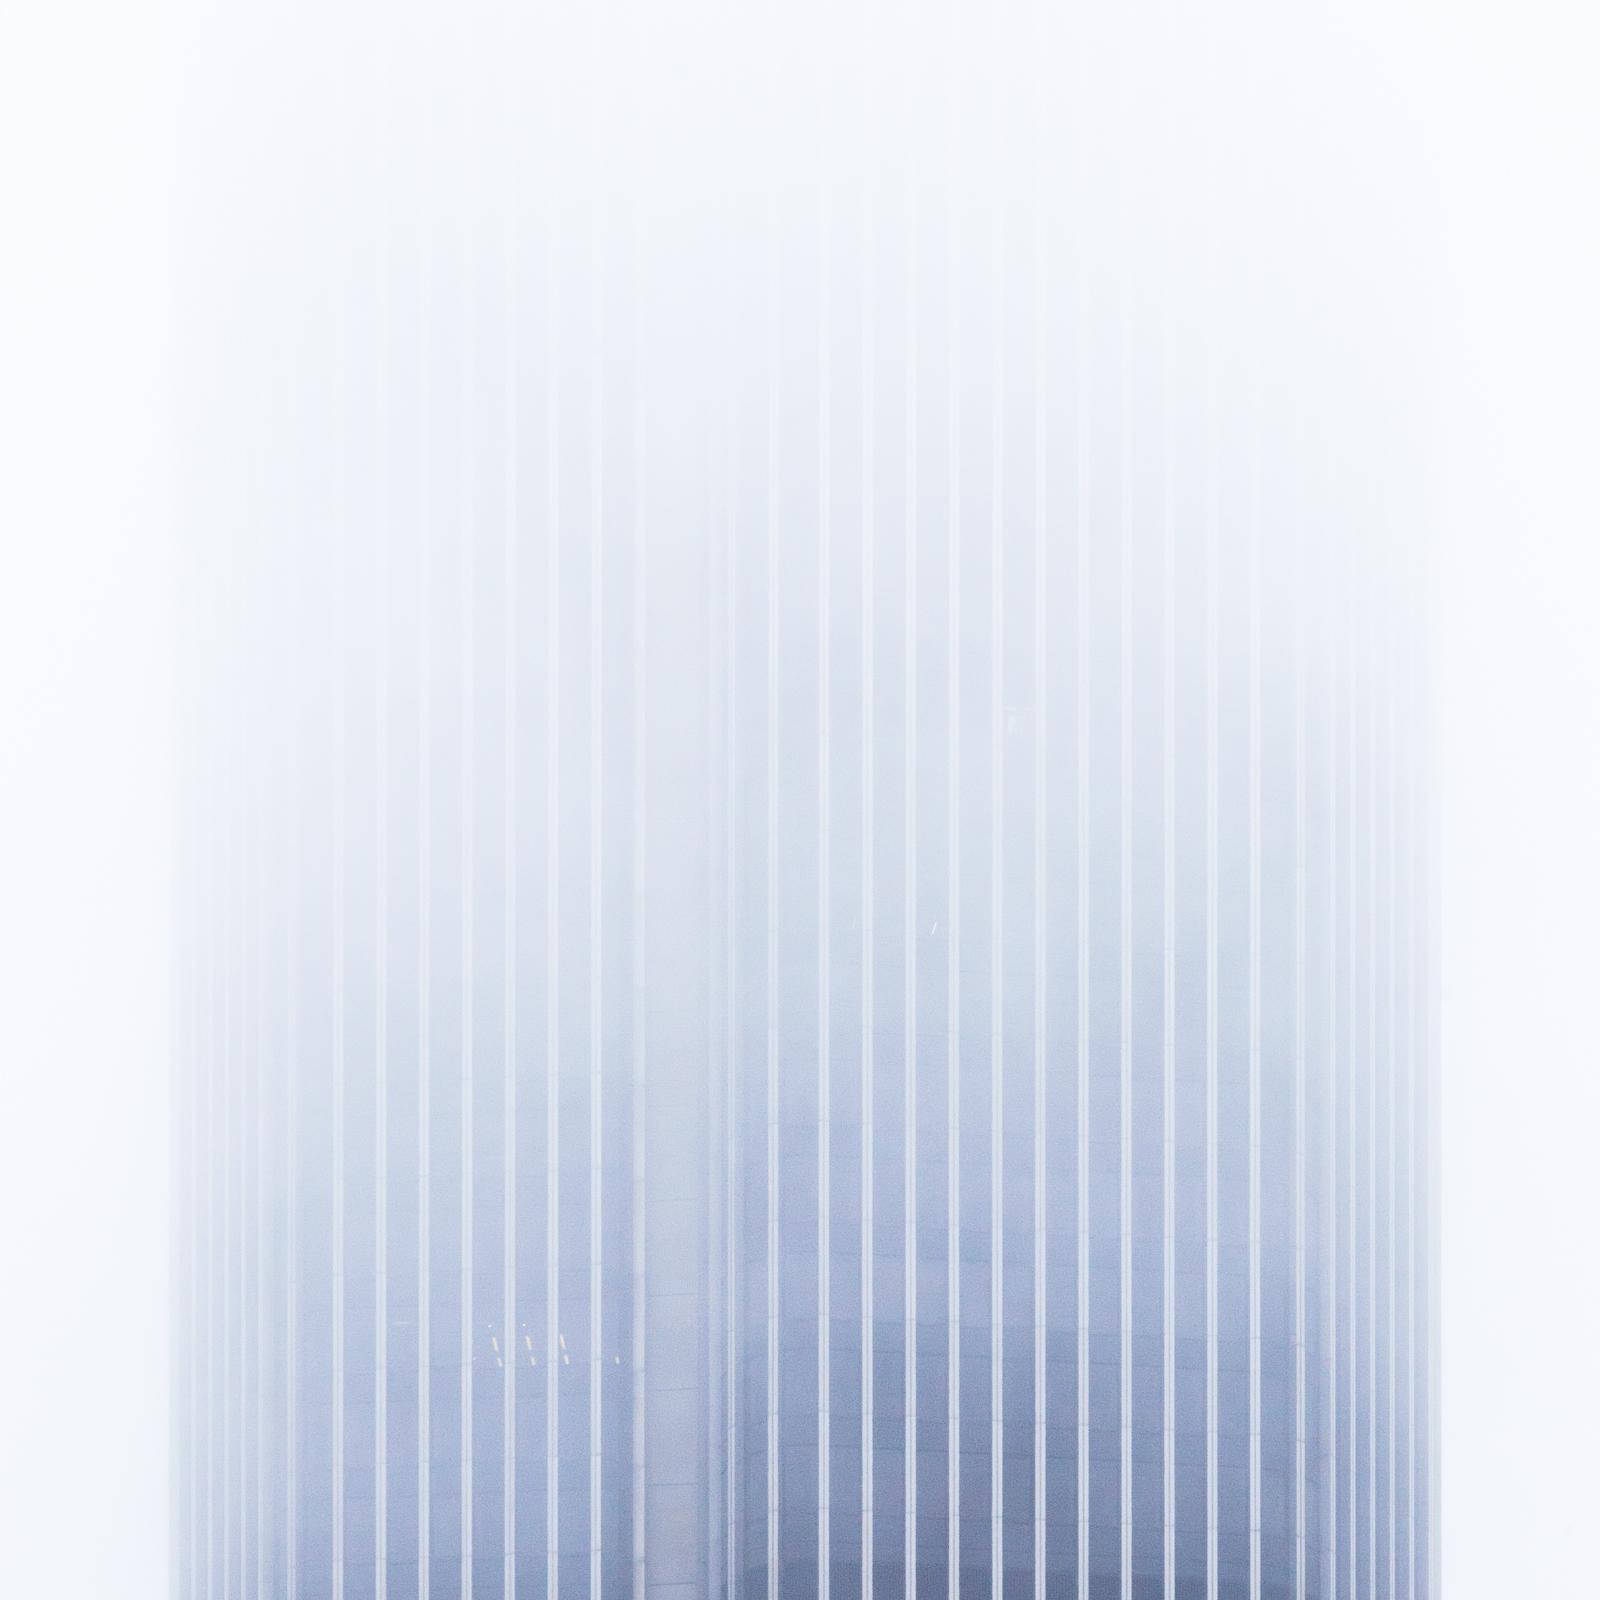 02@2x.jpg